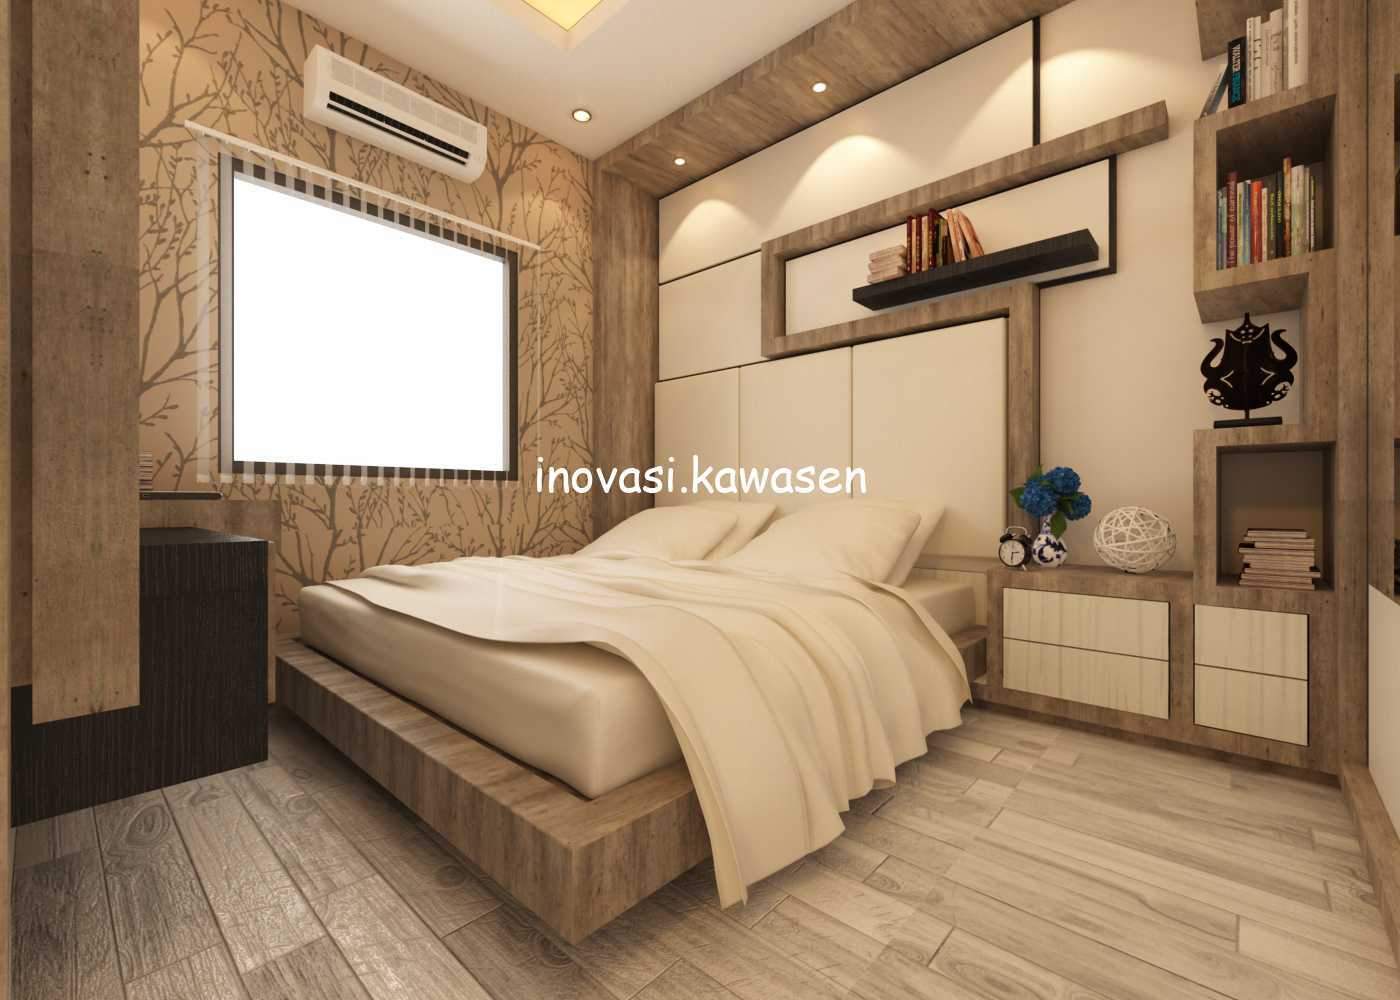 Inovasi Kawasen Interior Apartment Jakarta, Daerah Khusus Ibukota Jakarta, Indonesia Jakarta, Daerah Khusus Ibukota Jakarta, Indonesia Inovasi-Kawasen-Interior-Apartment   89762